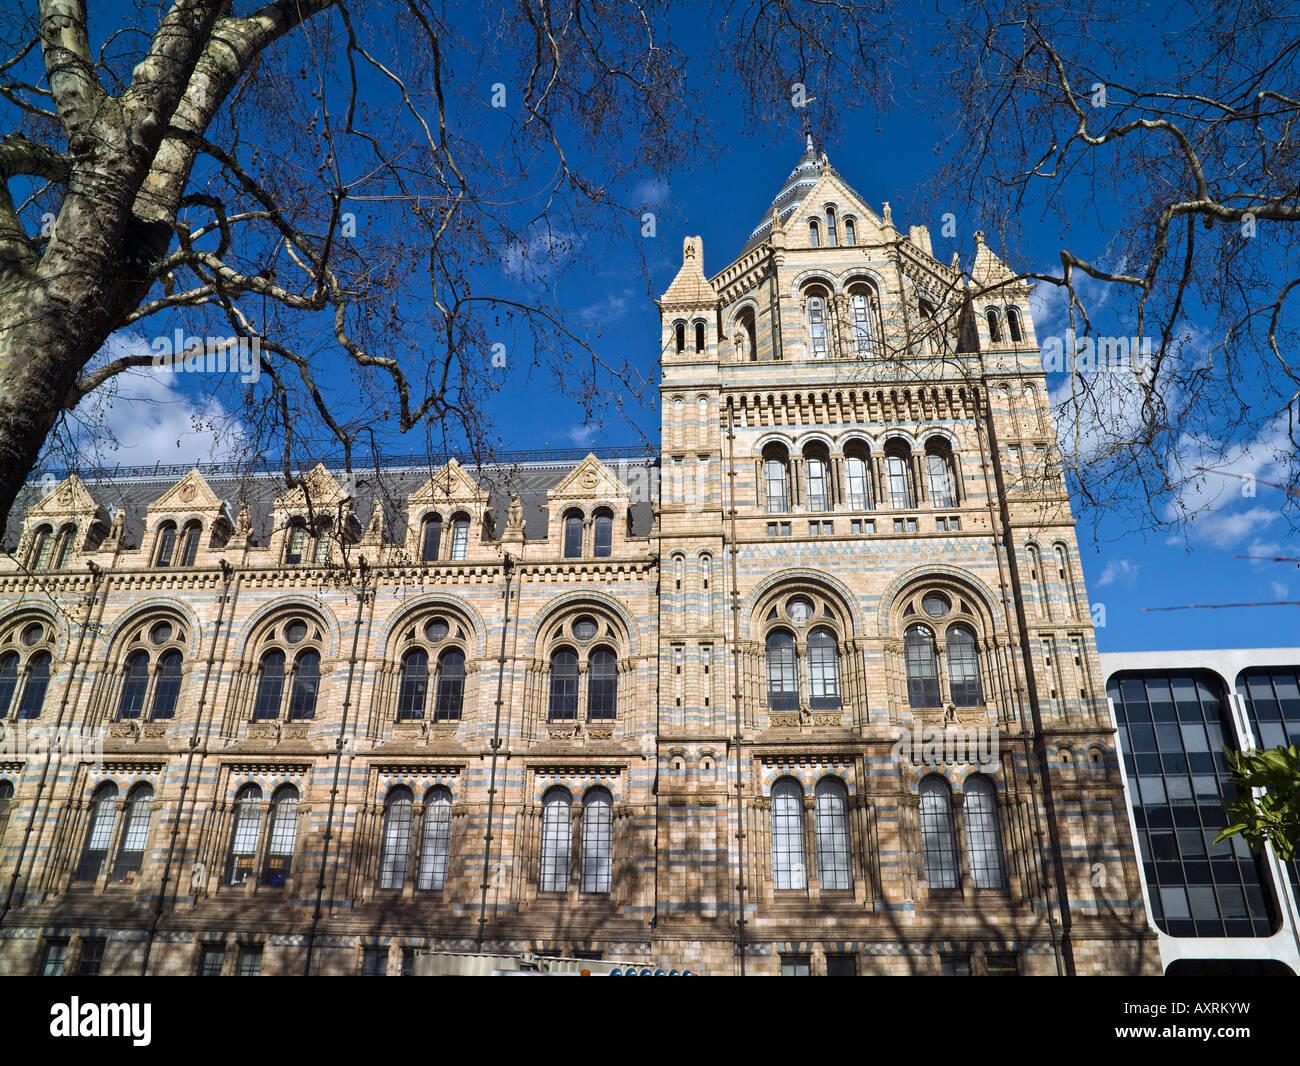 main facade, Museum of Natural History, London - Stock Image